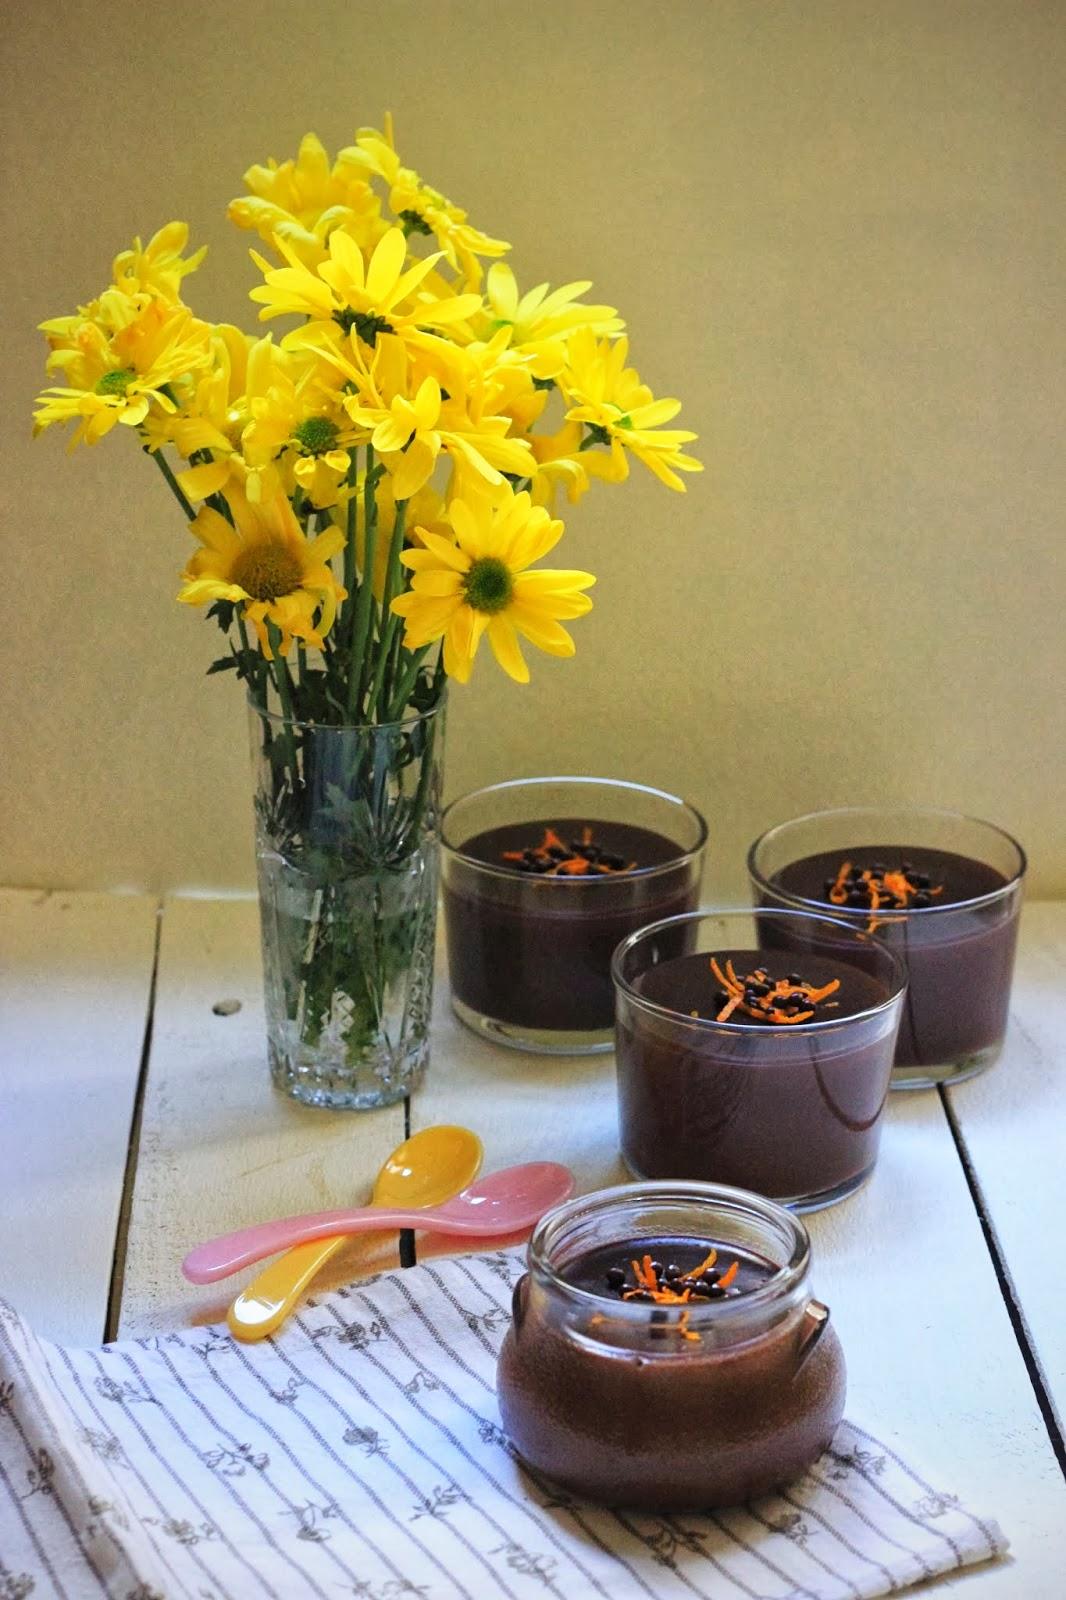 portakalli cikolatali puding 1